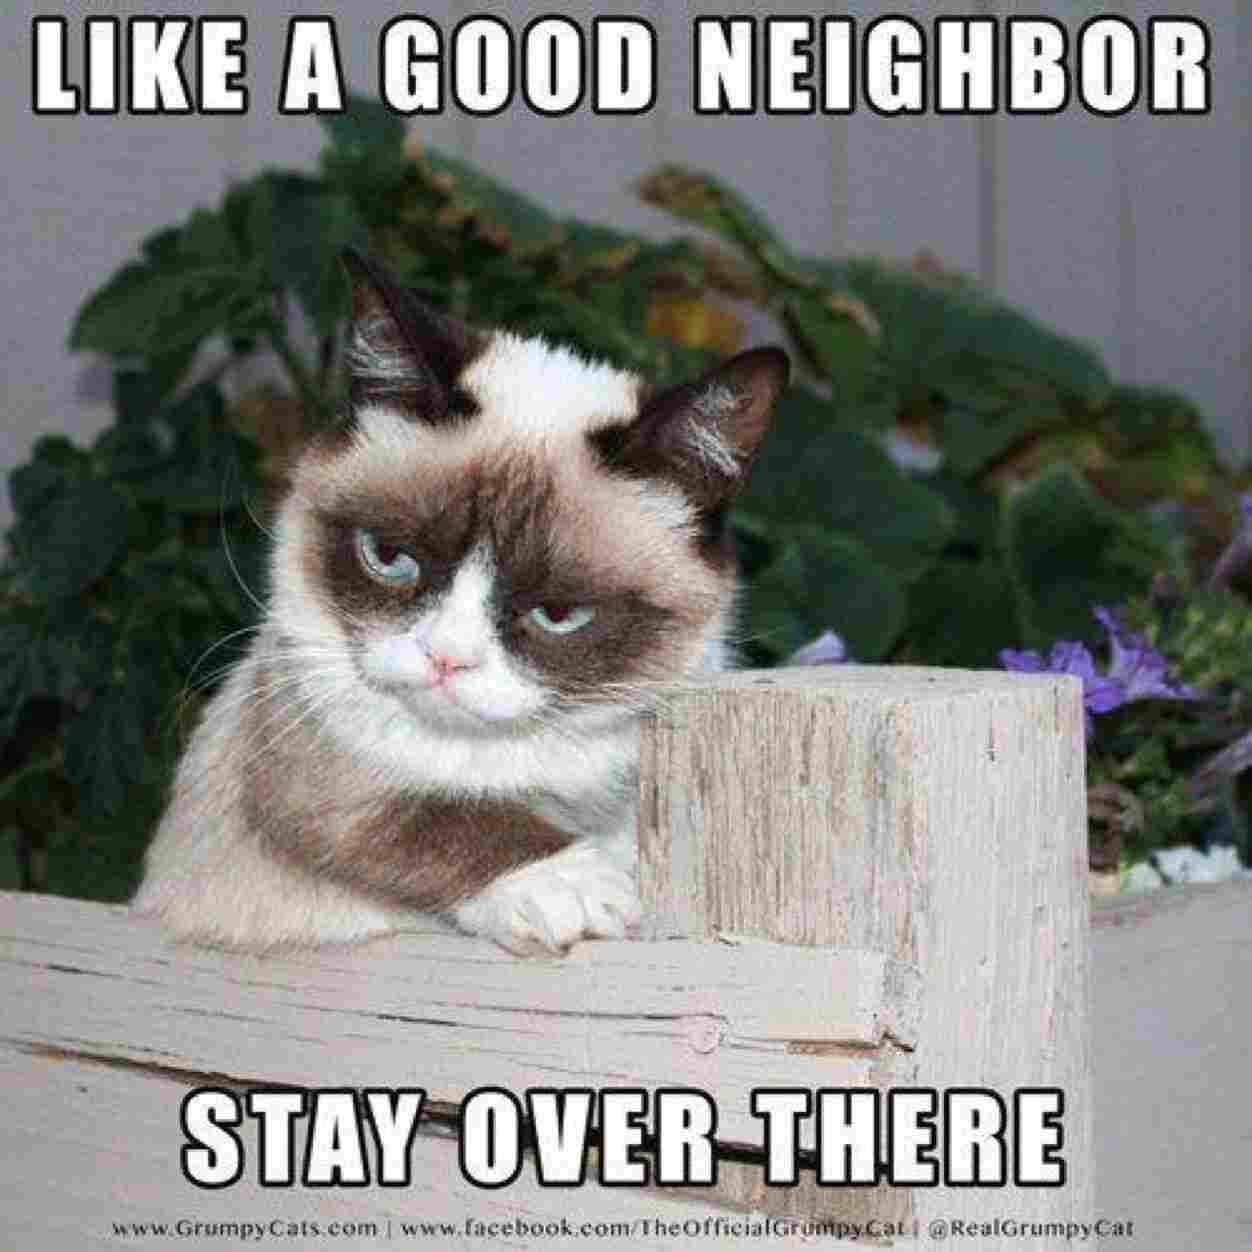 Funny Cat Memes Dump 2018 54 Pictures Ladnow Grumpy Cat Quotes Grumpy Cat Humor Grumpy Cat Meme